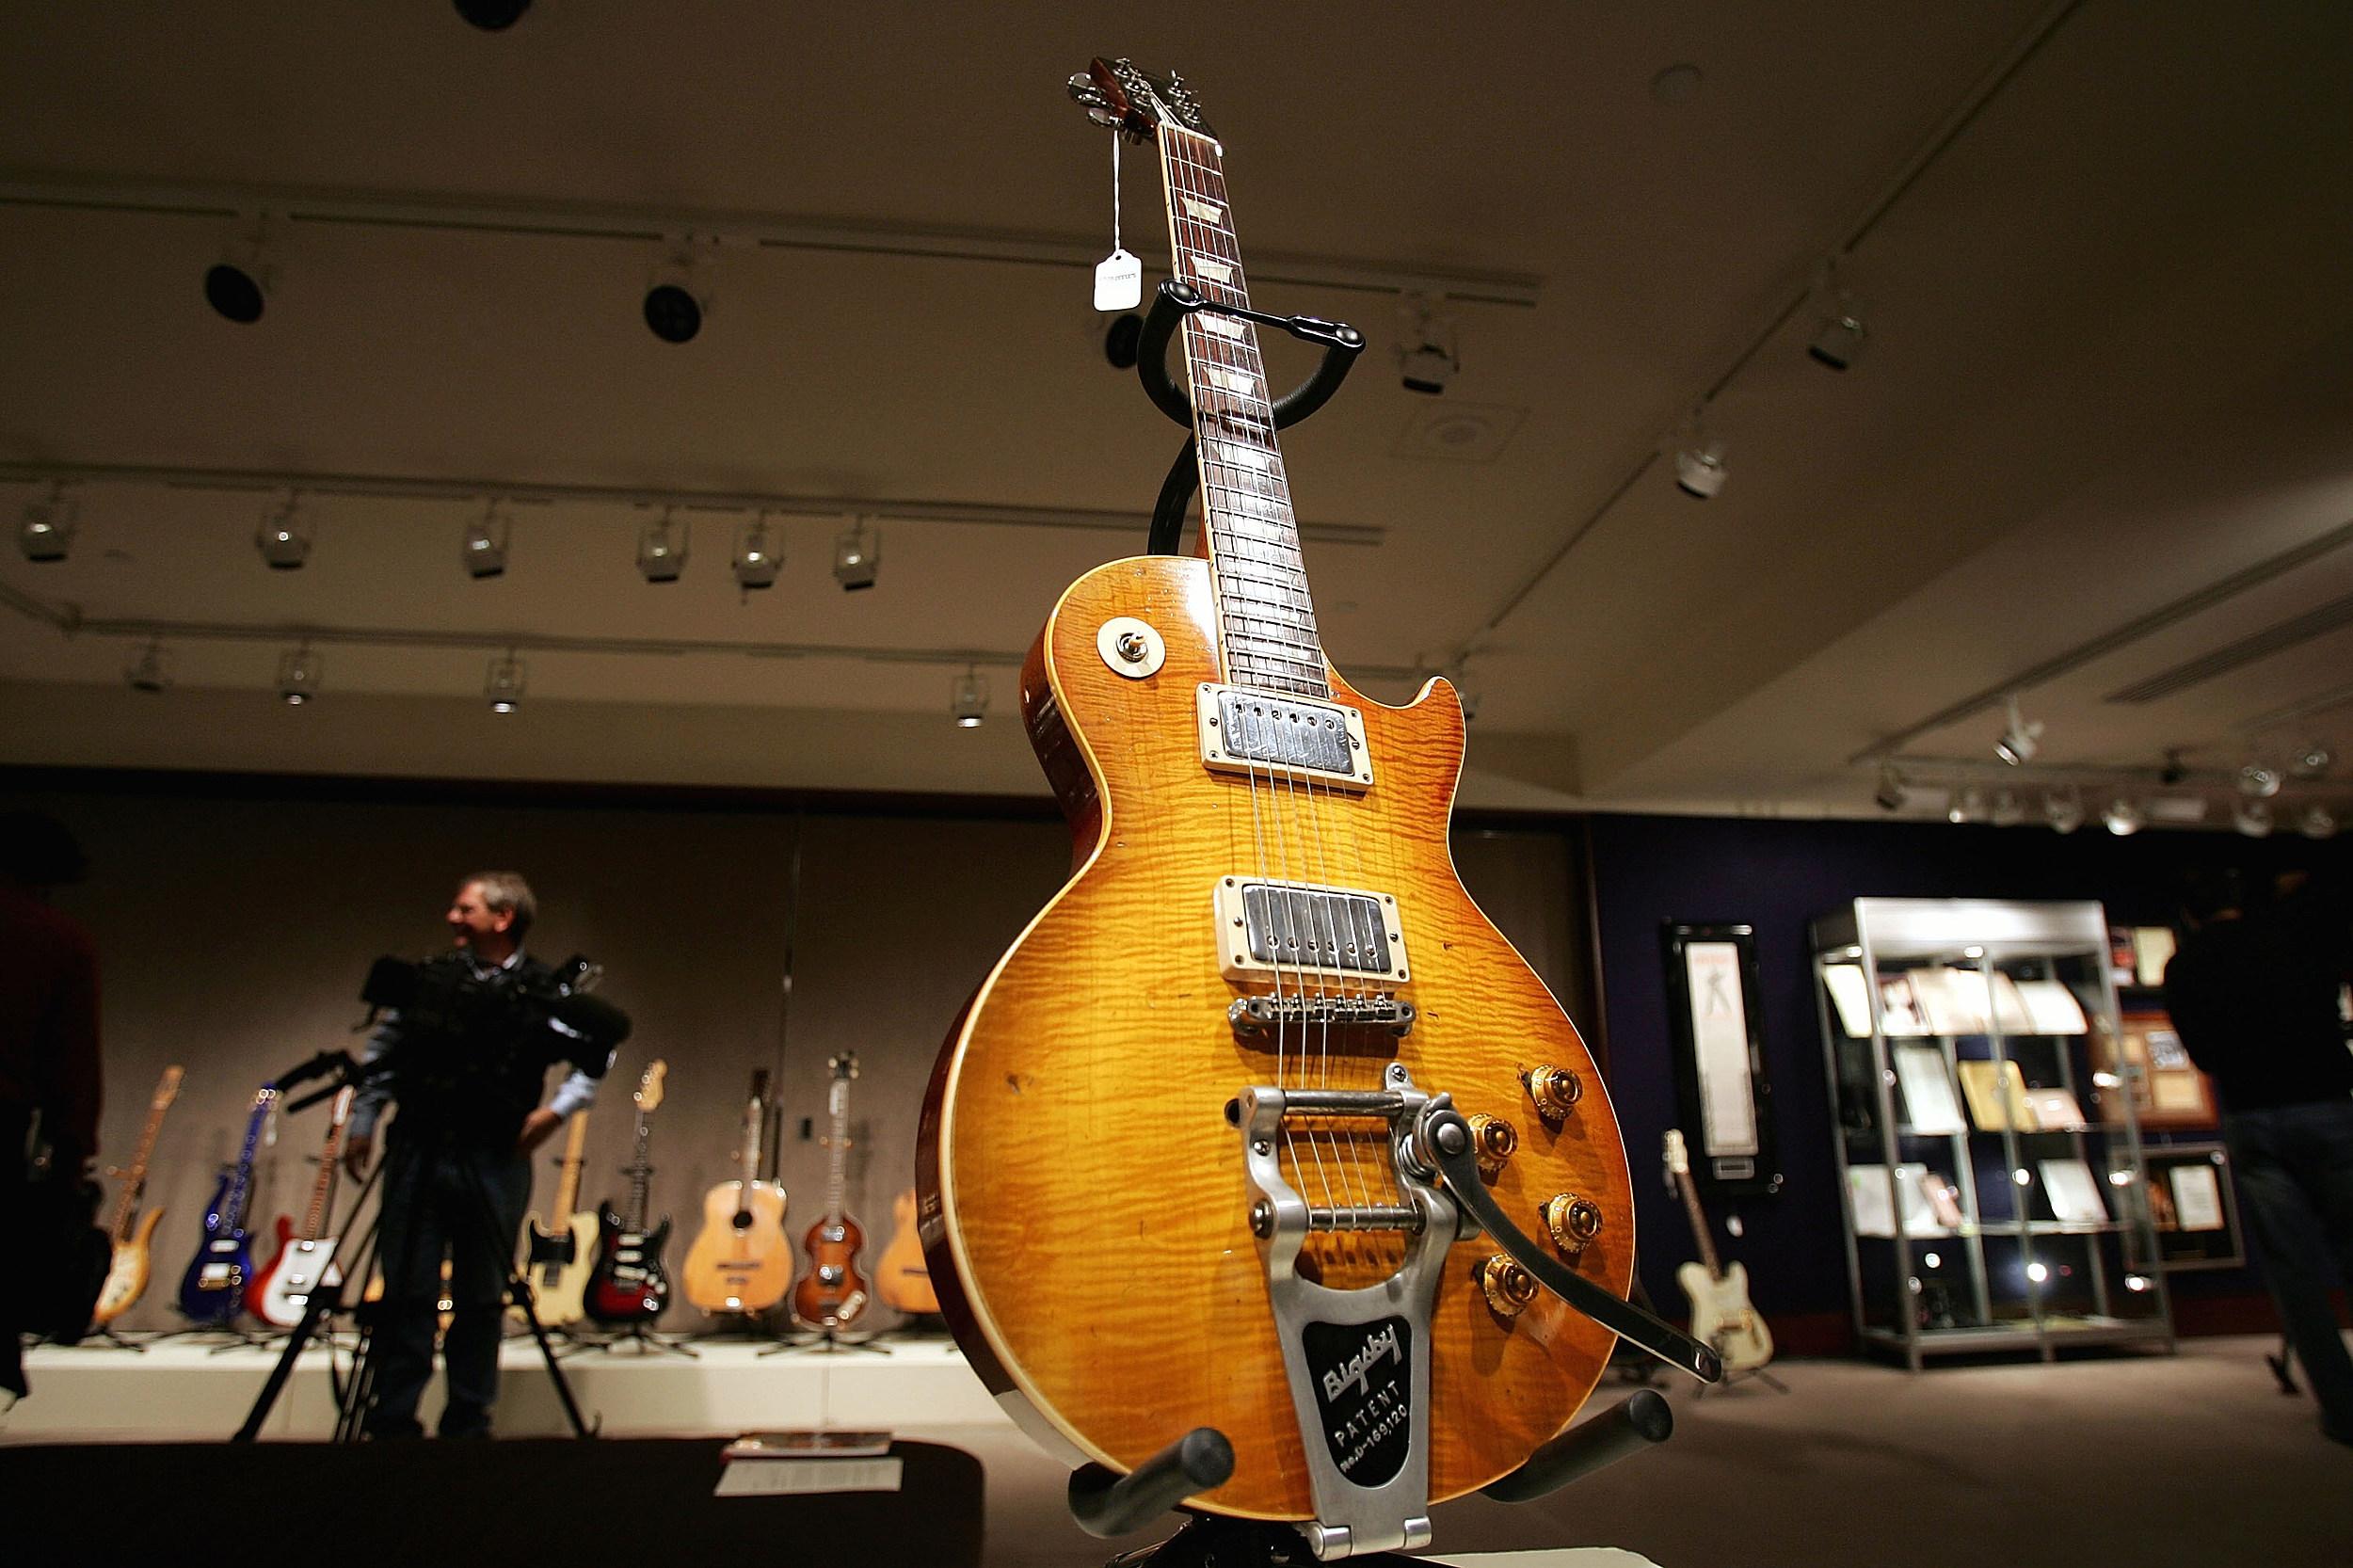 Christies Auctions Off Rock N Roll Memorabilia